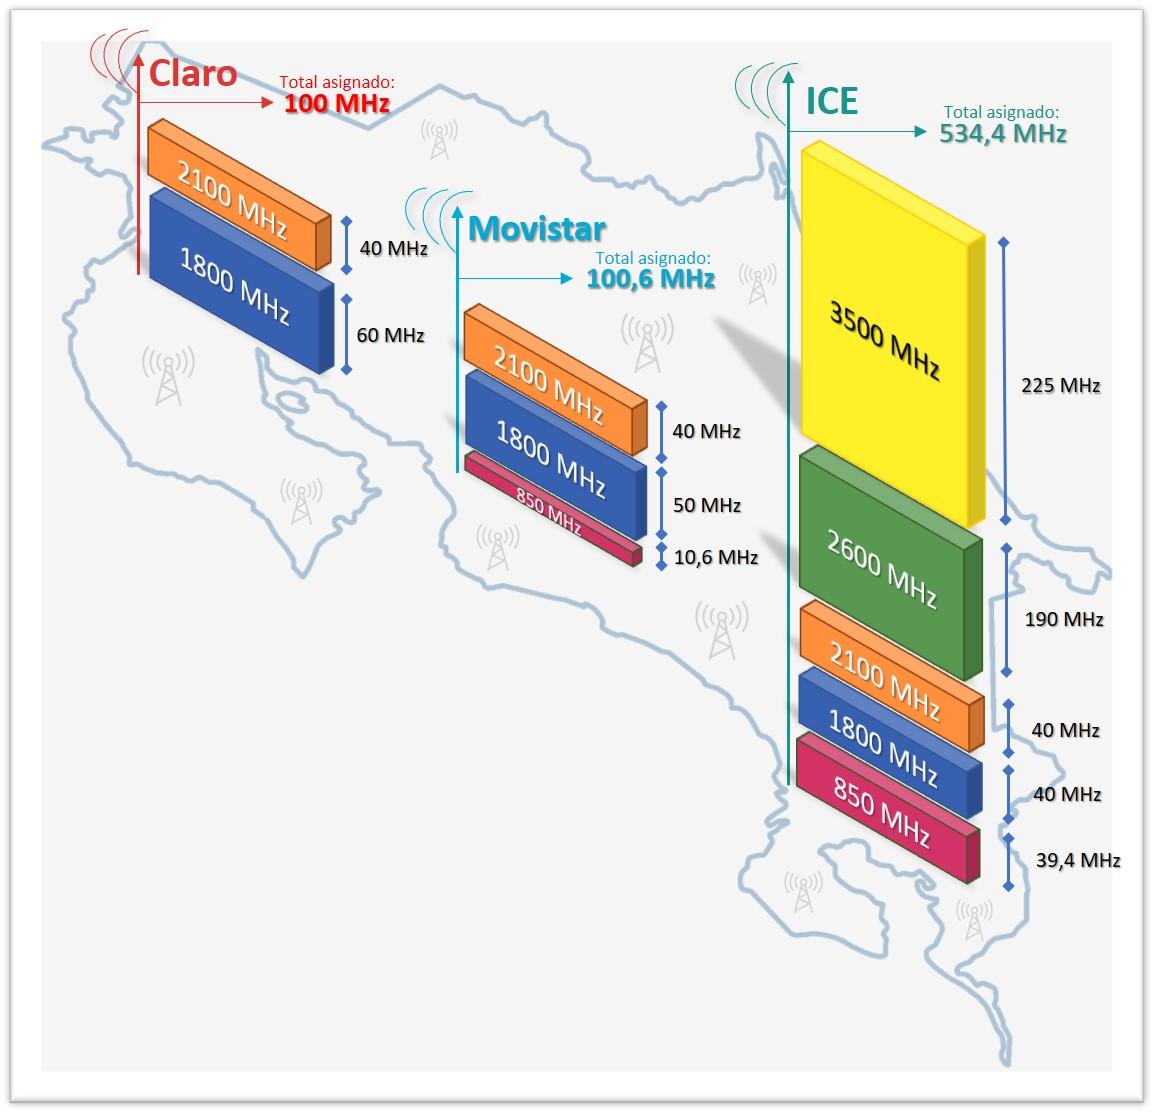 Asignación de espectro para servicios móviles en Costa Rica